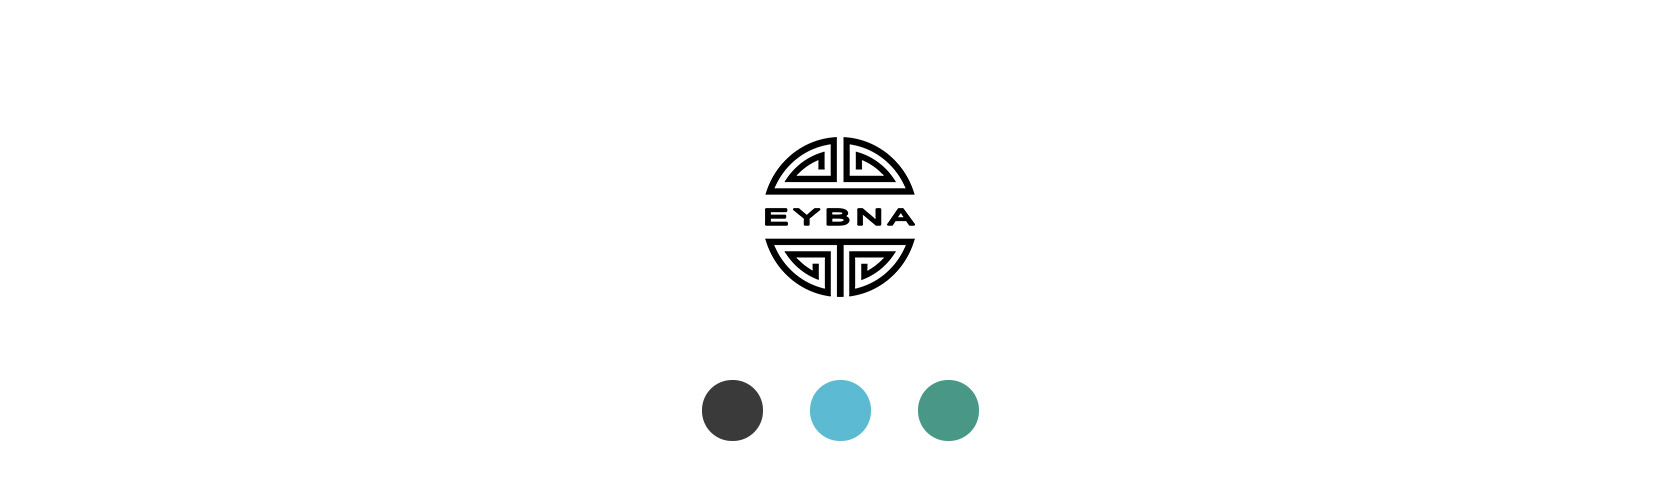 Eybna Technologies